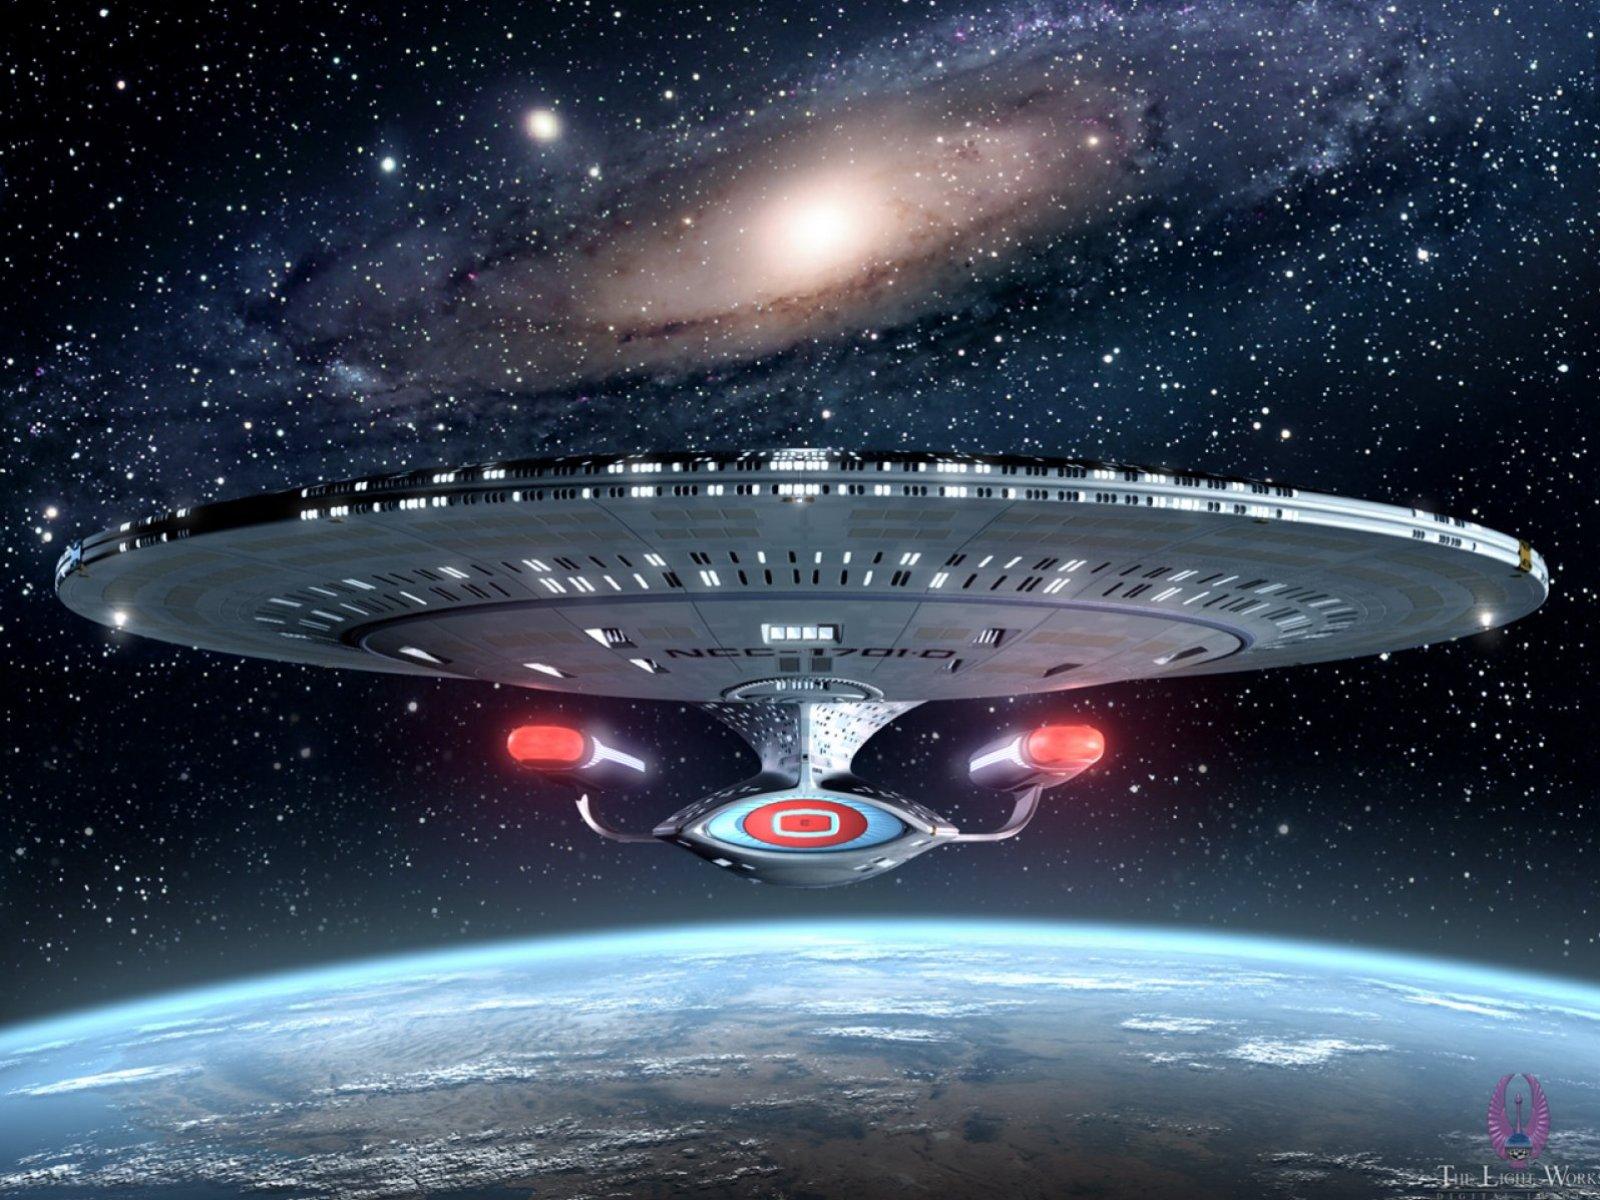 http://1.bp.blogspot.com/-e6Ttzmh3Bq8/TW-g3wcQsnI/AAAAAAAAAH4/UQnIhIXQyMY/s1600/19_Star_Trek_Enterprise_NCC1701D_starship_wallpaper_xx.jpg